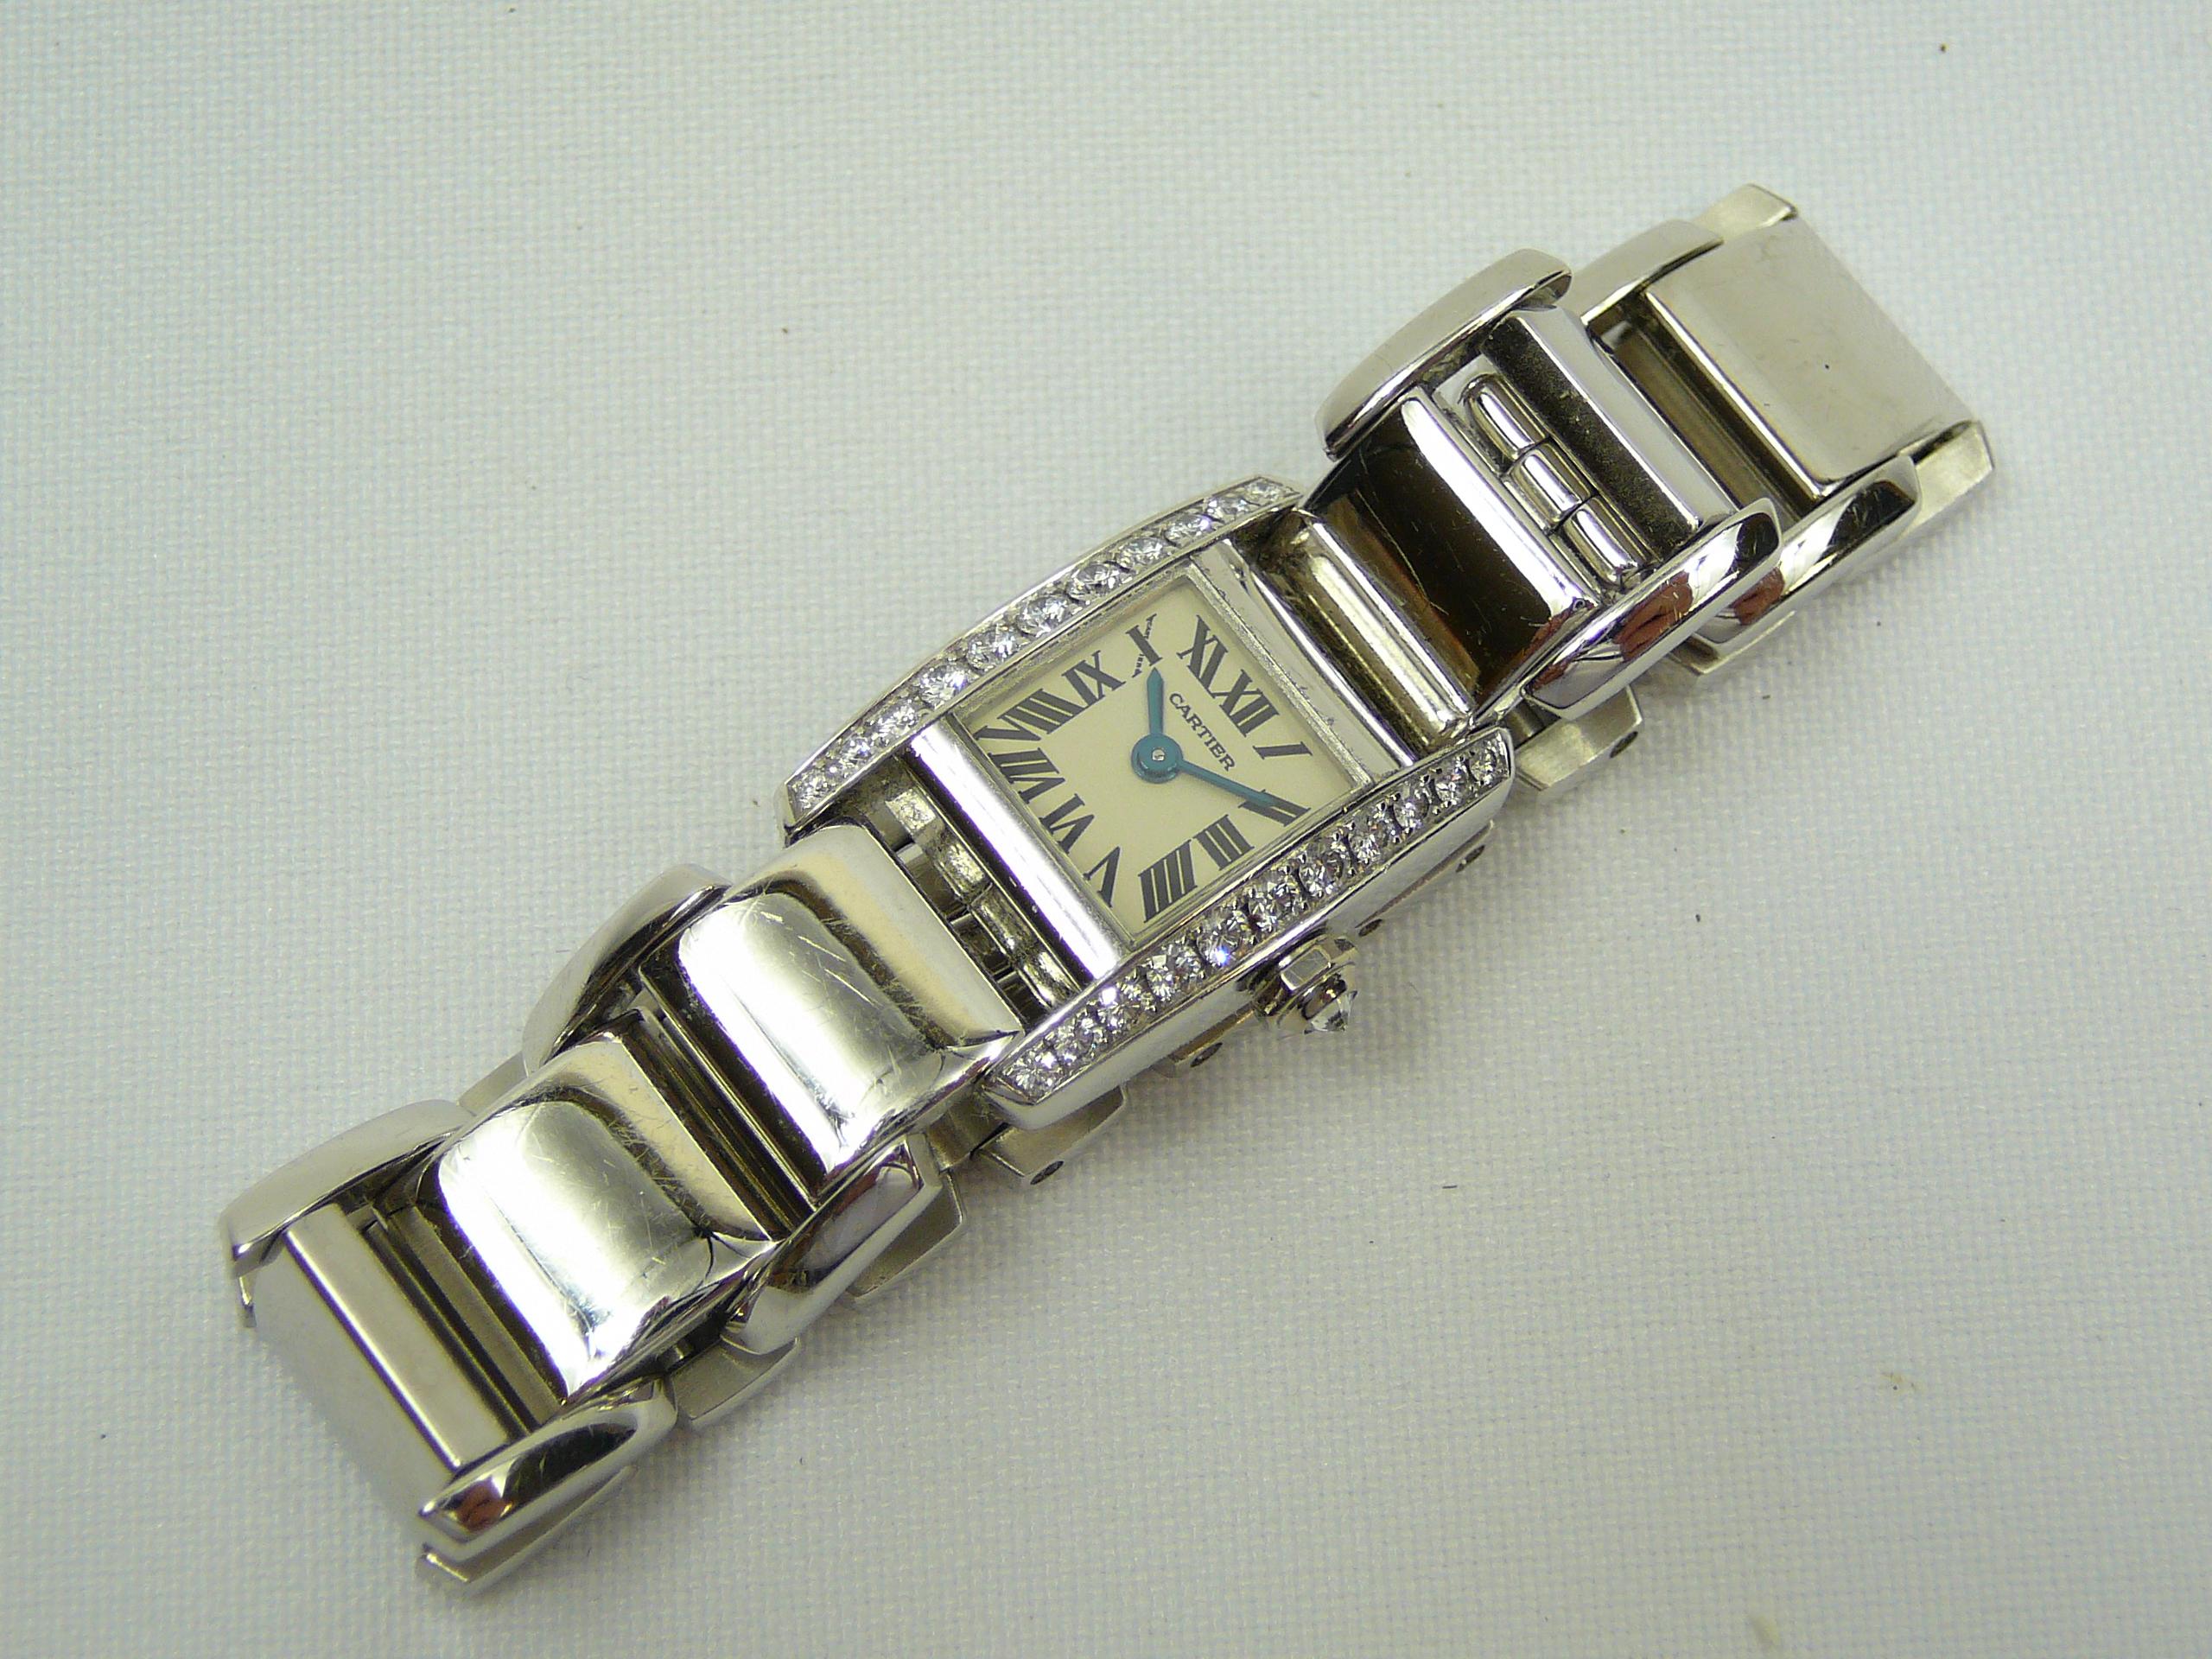 Ladies Gold Cartier Wrist Watch - Image 3 of 5